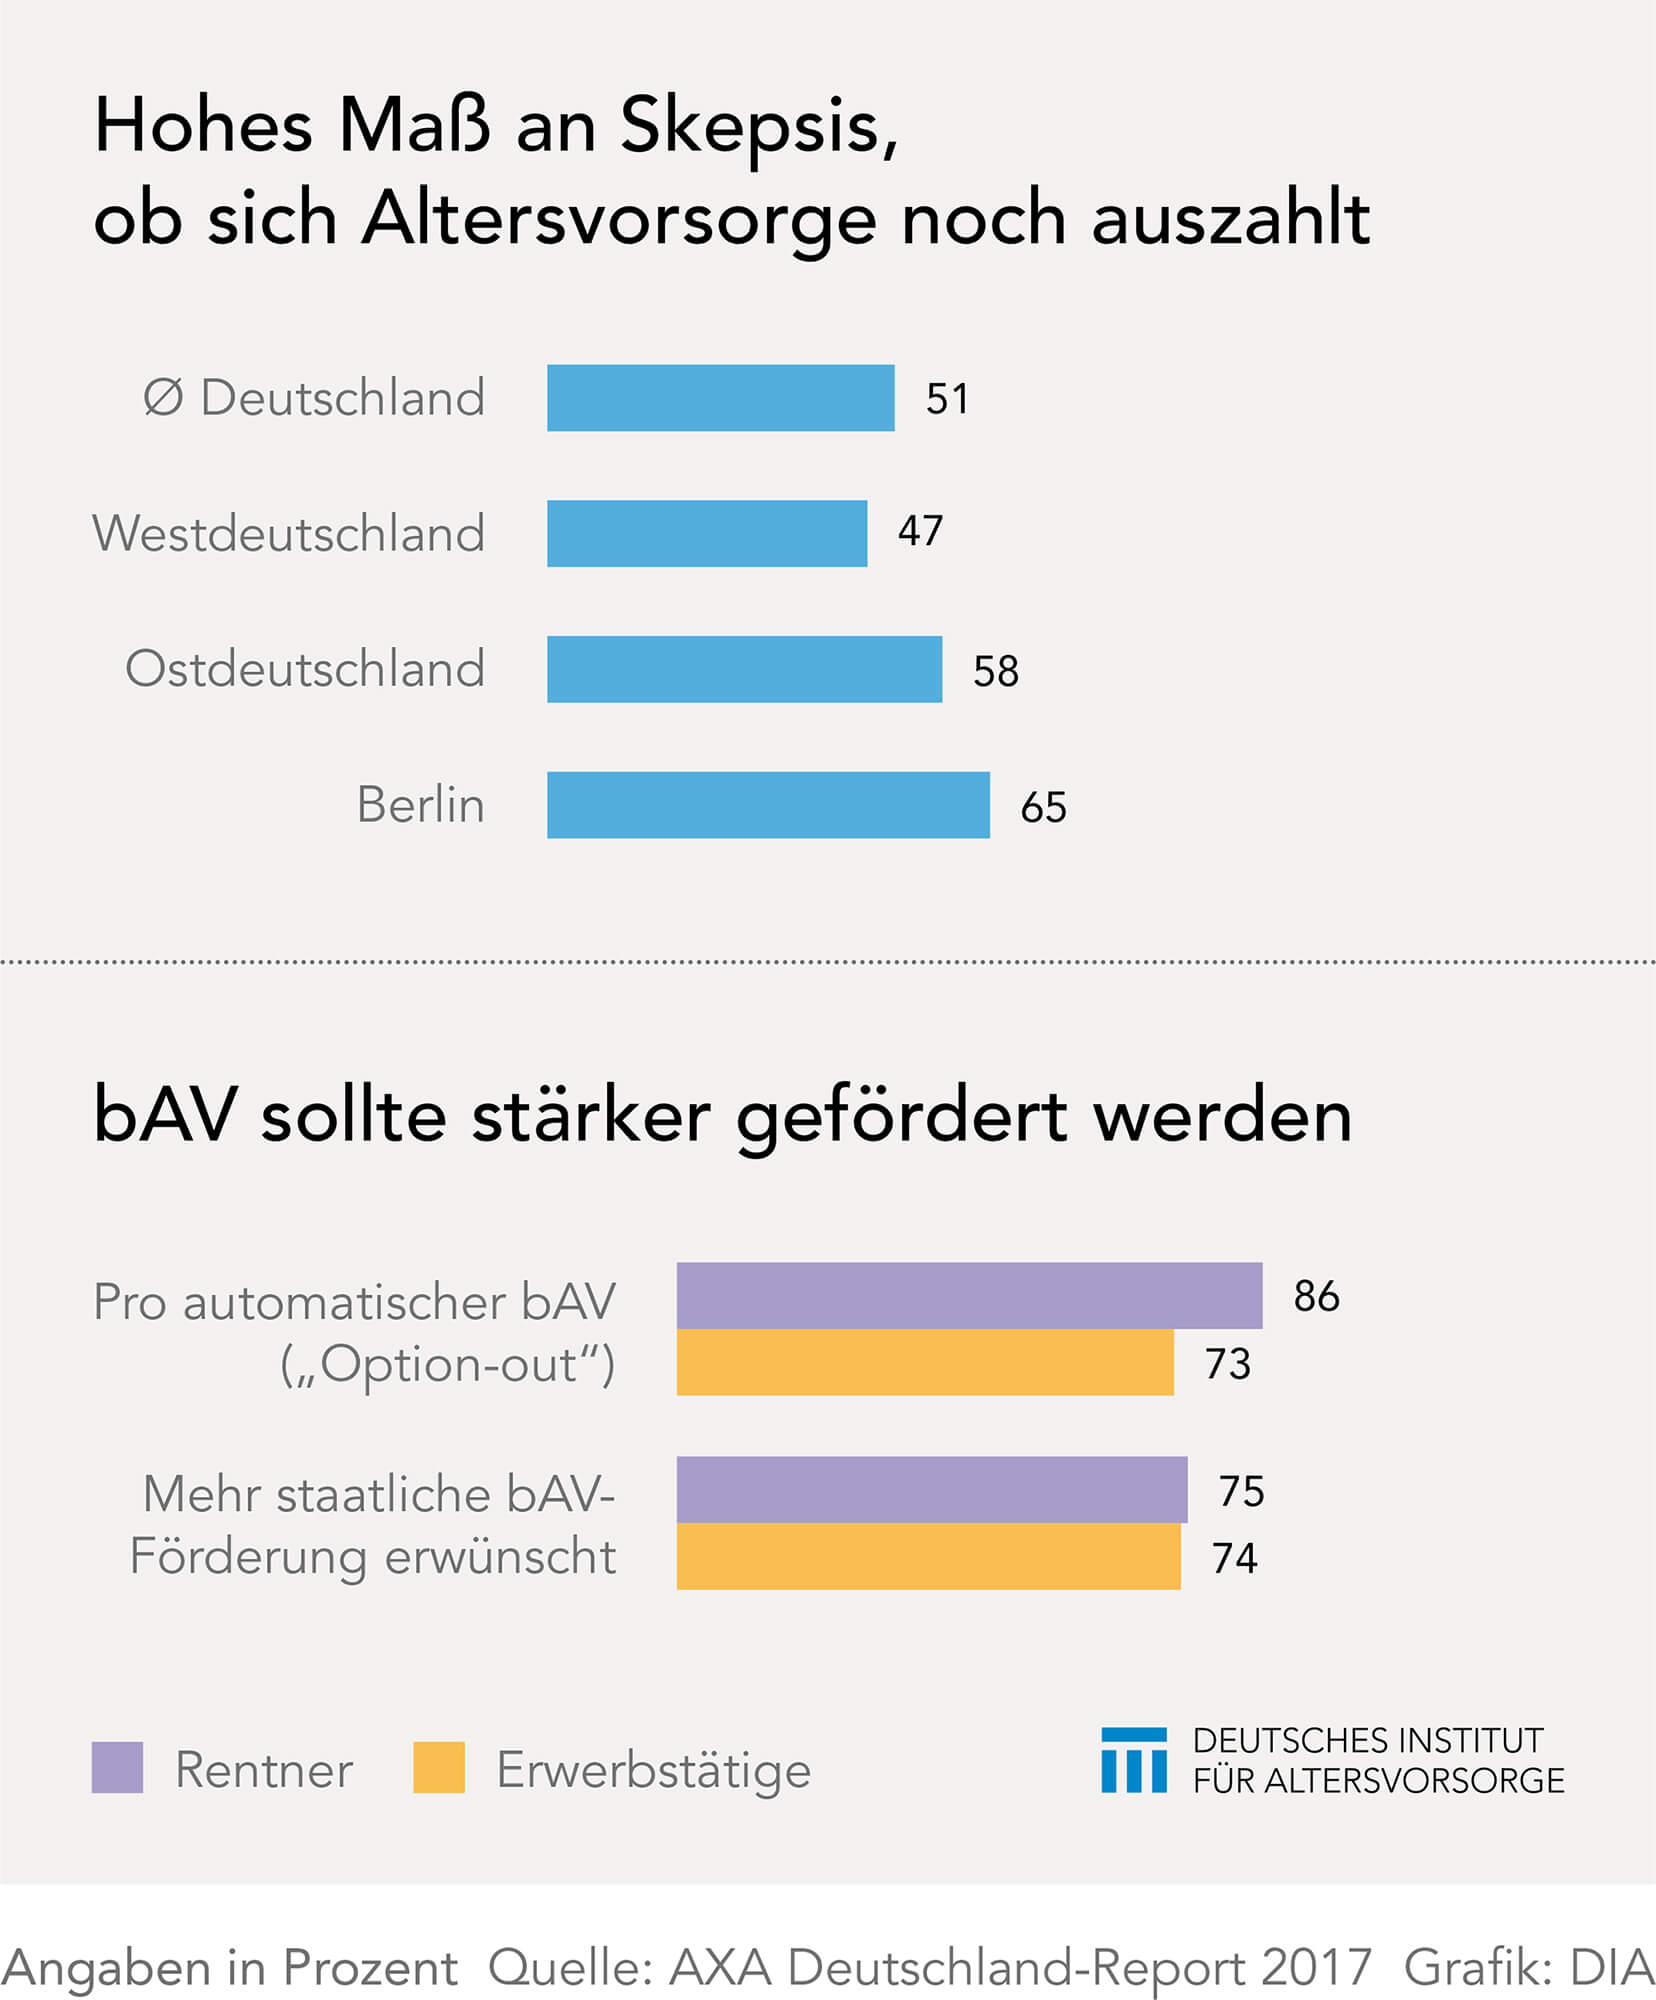 AXA-Umfrage Skepsis zur Altersvorsorge